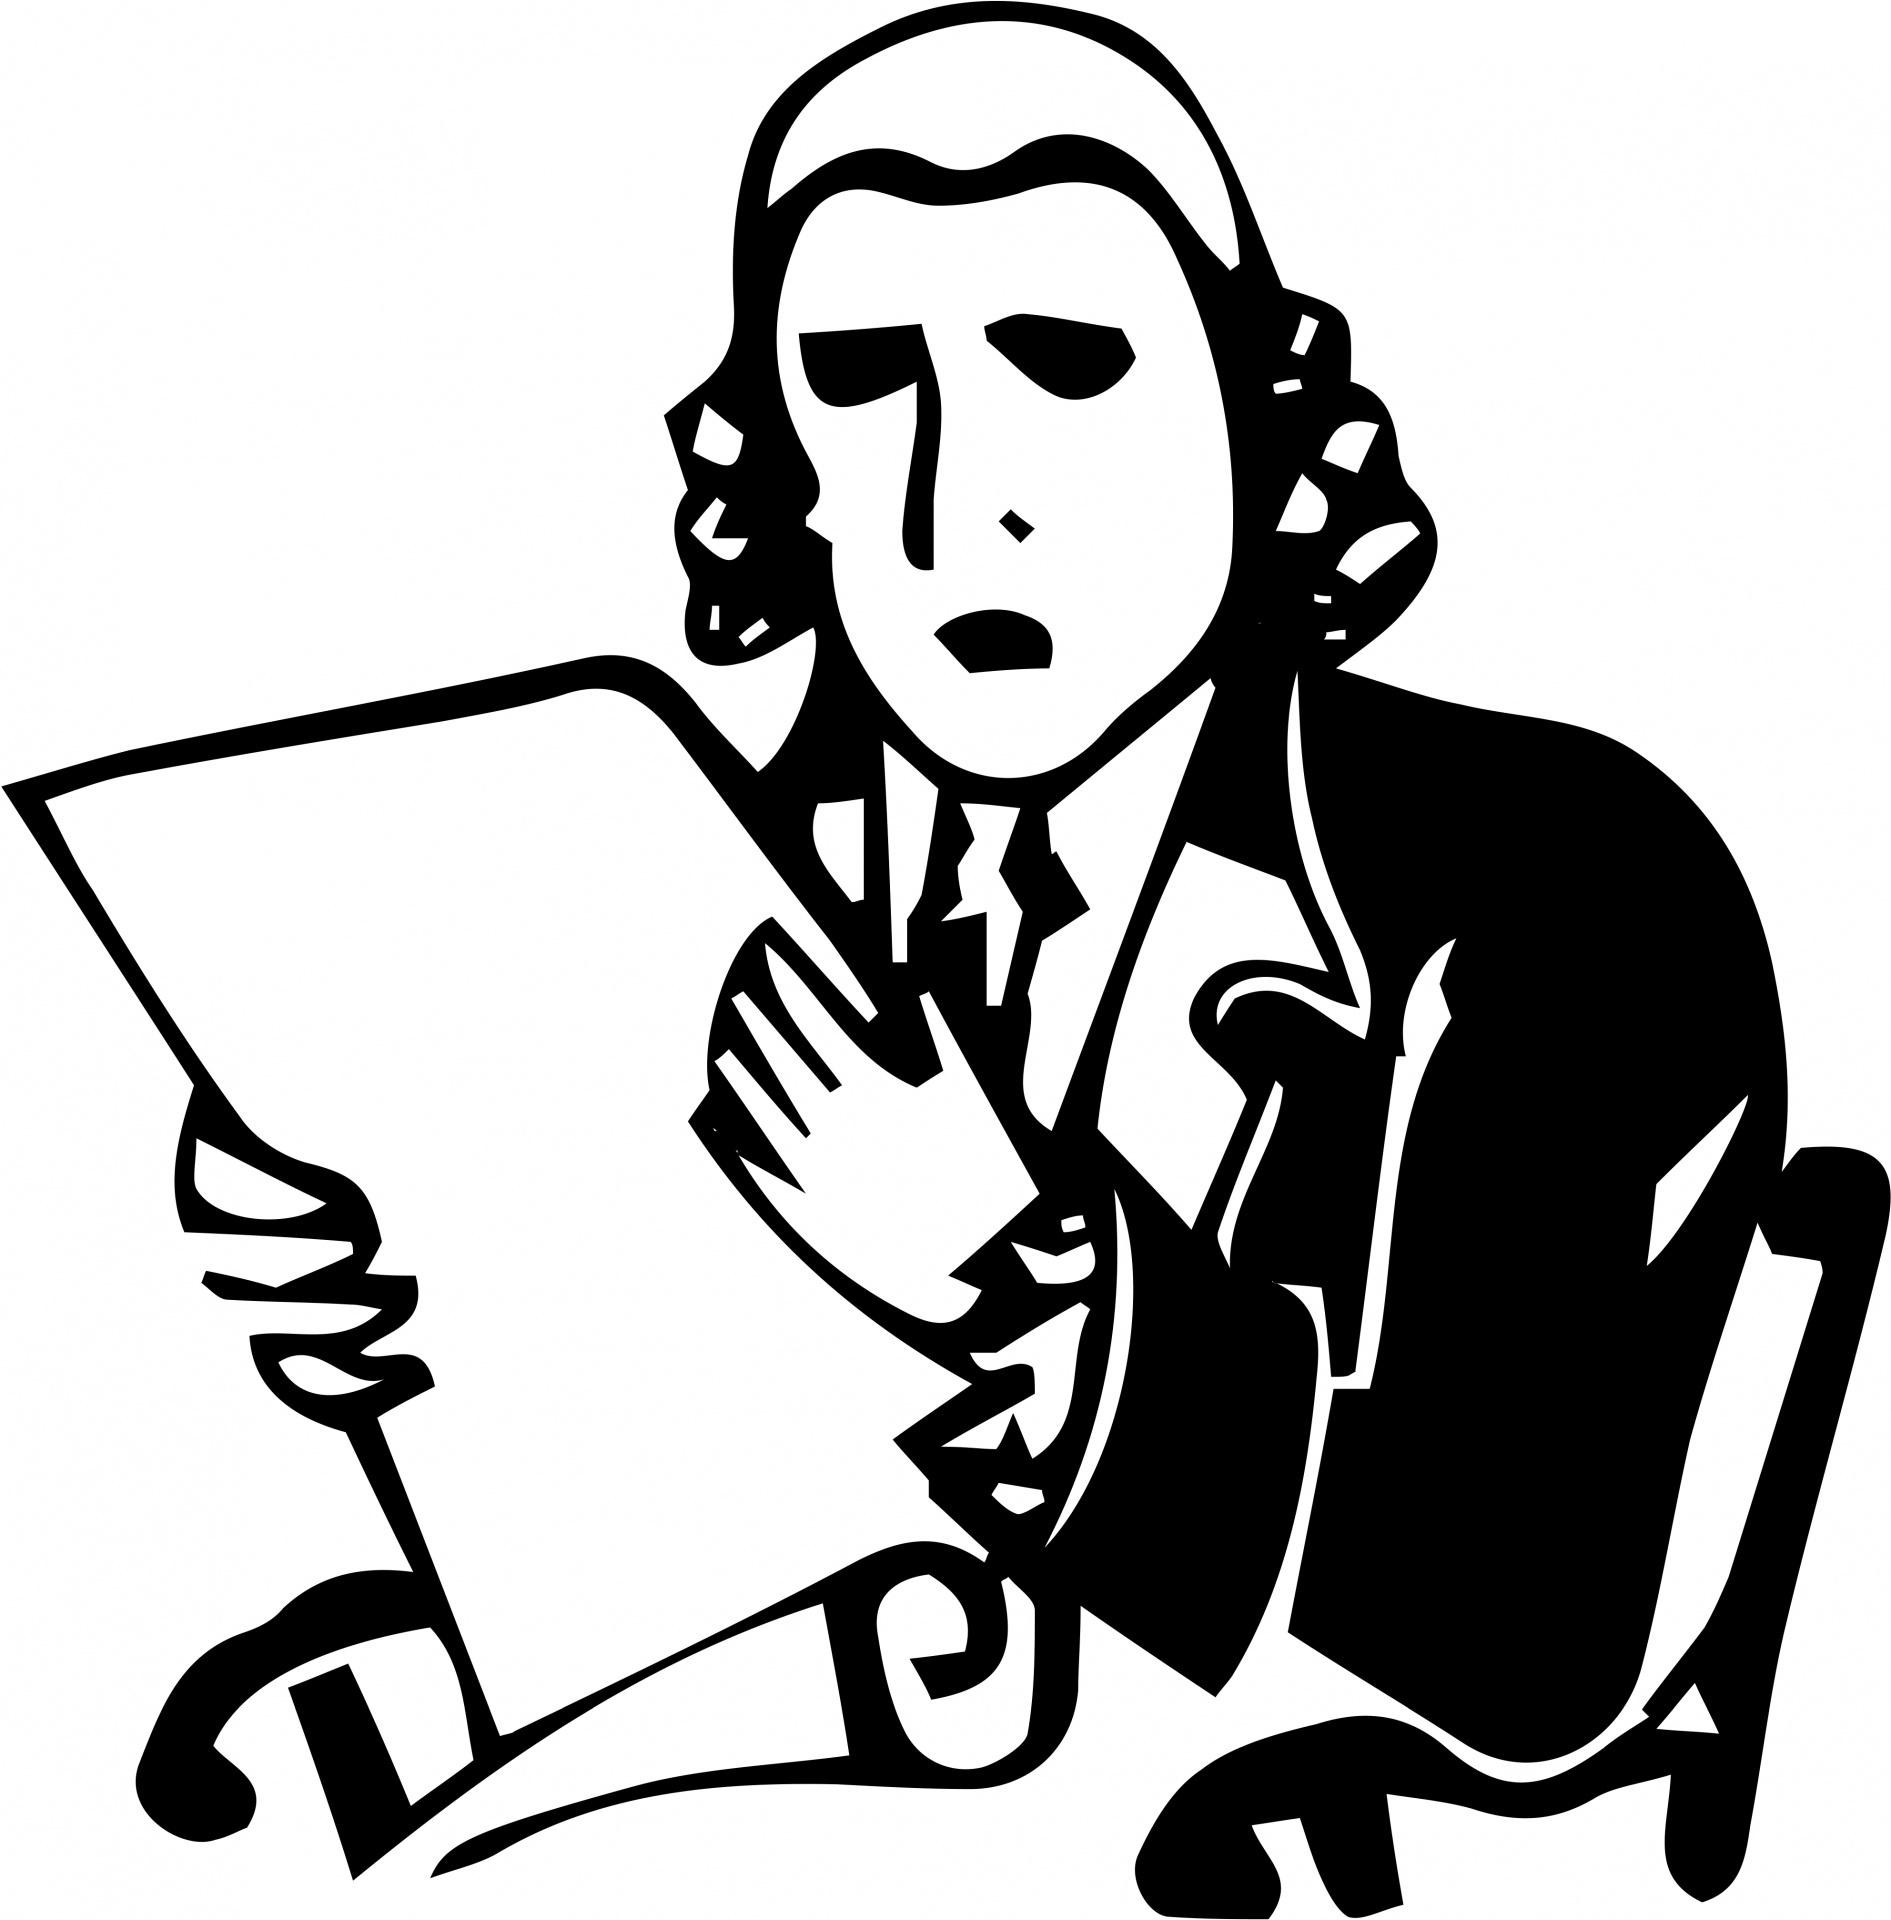 obituary, probate, Michigan probate process, probate lawyer, estate plan, will, trust